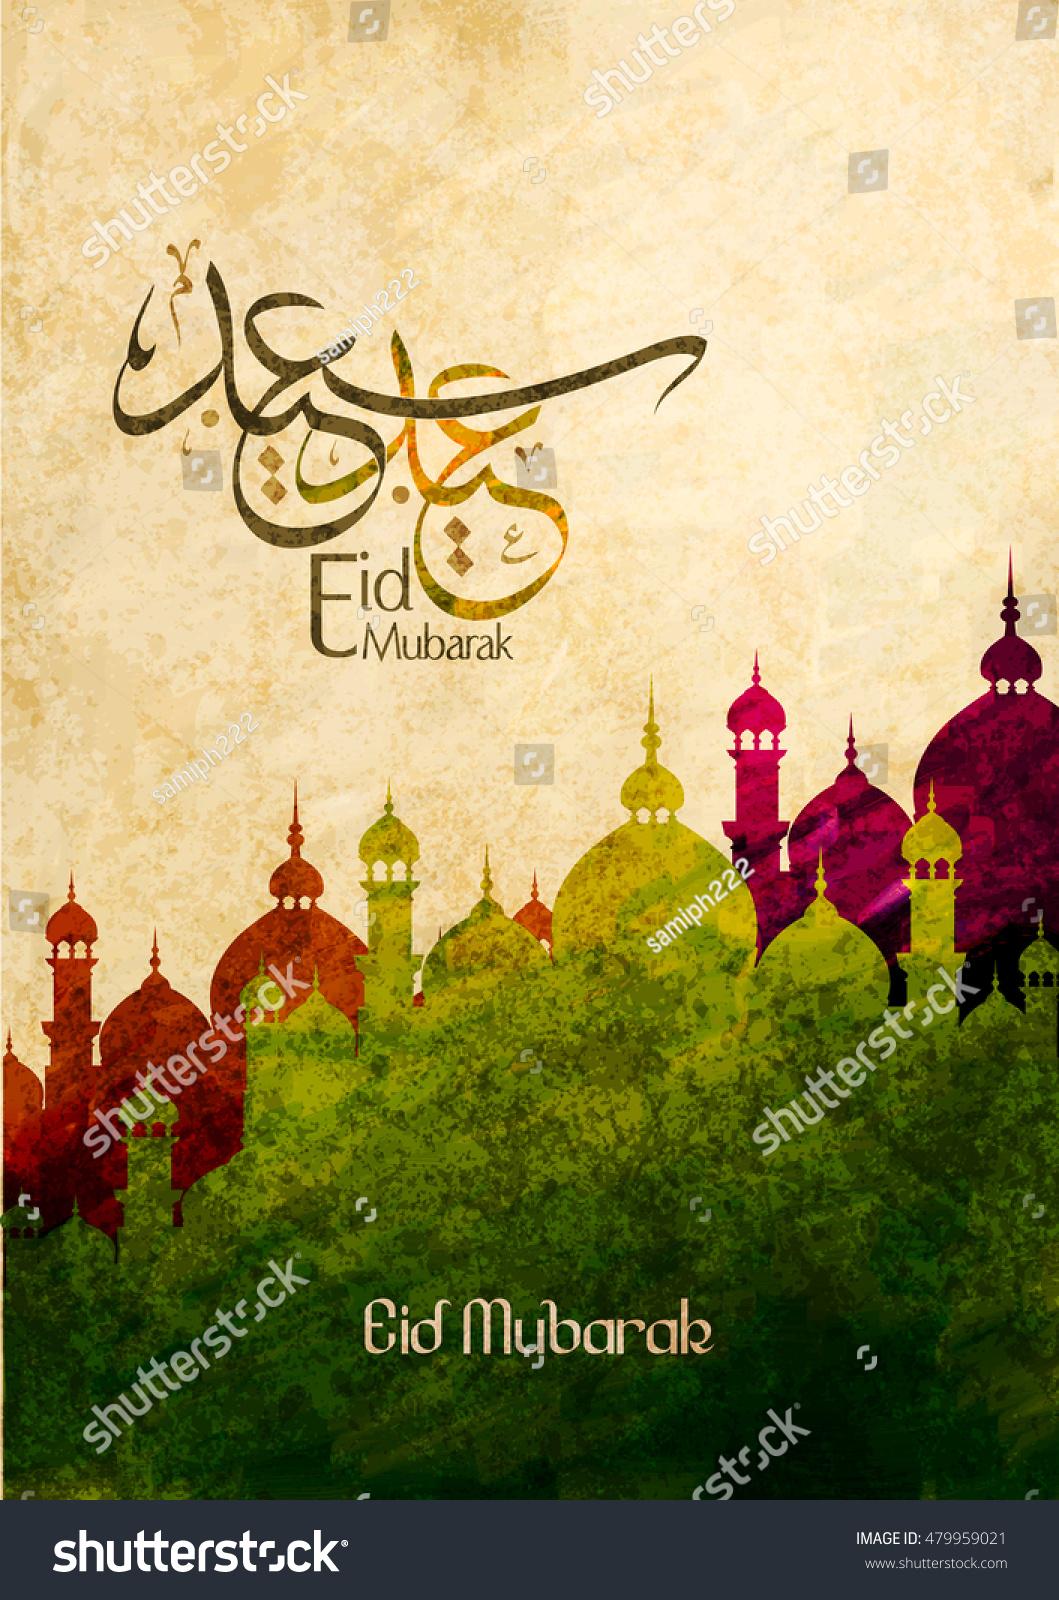 Eid Mubarak Greeting Card Old Grungy Stock Vector Hd Royalty Free